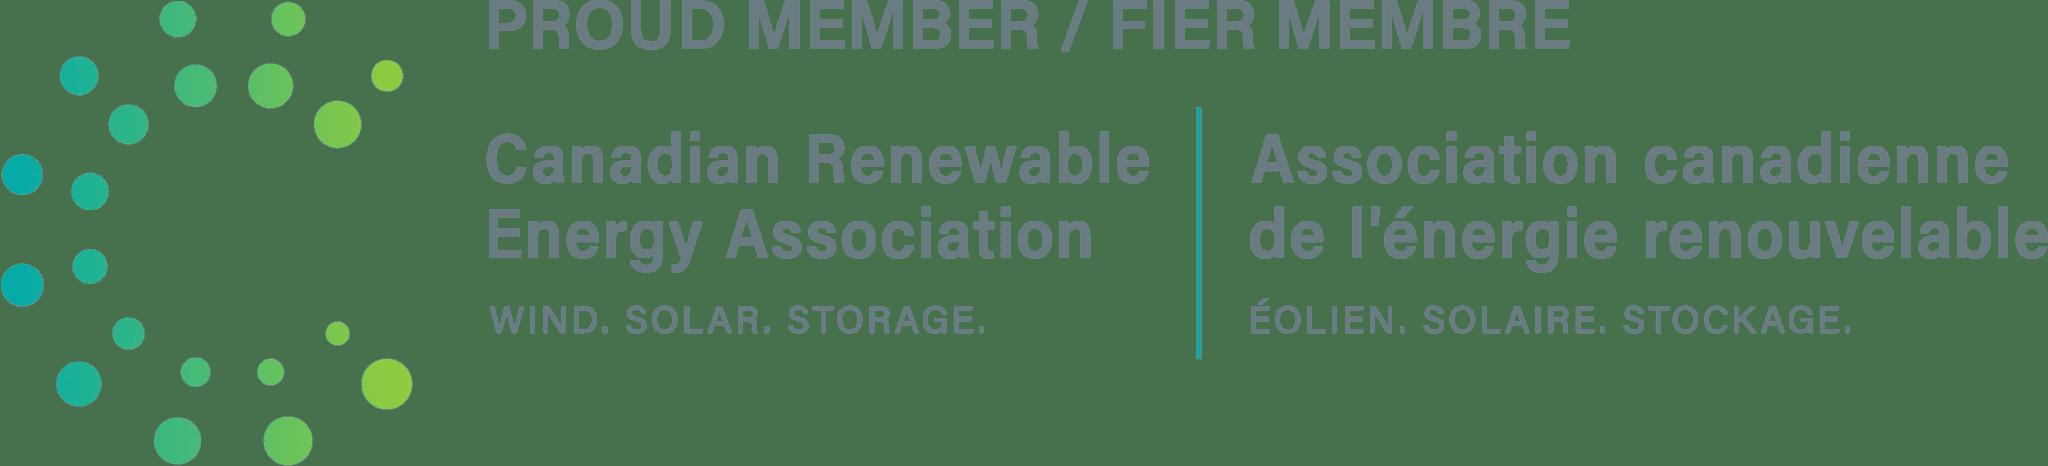 Canadian Renewable Energy Association